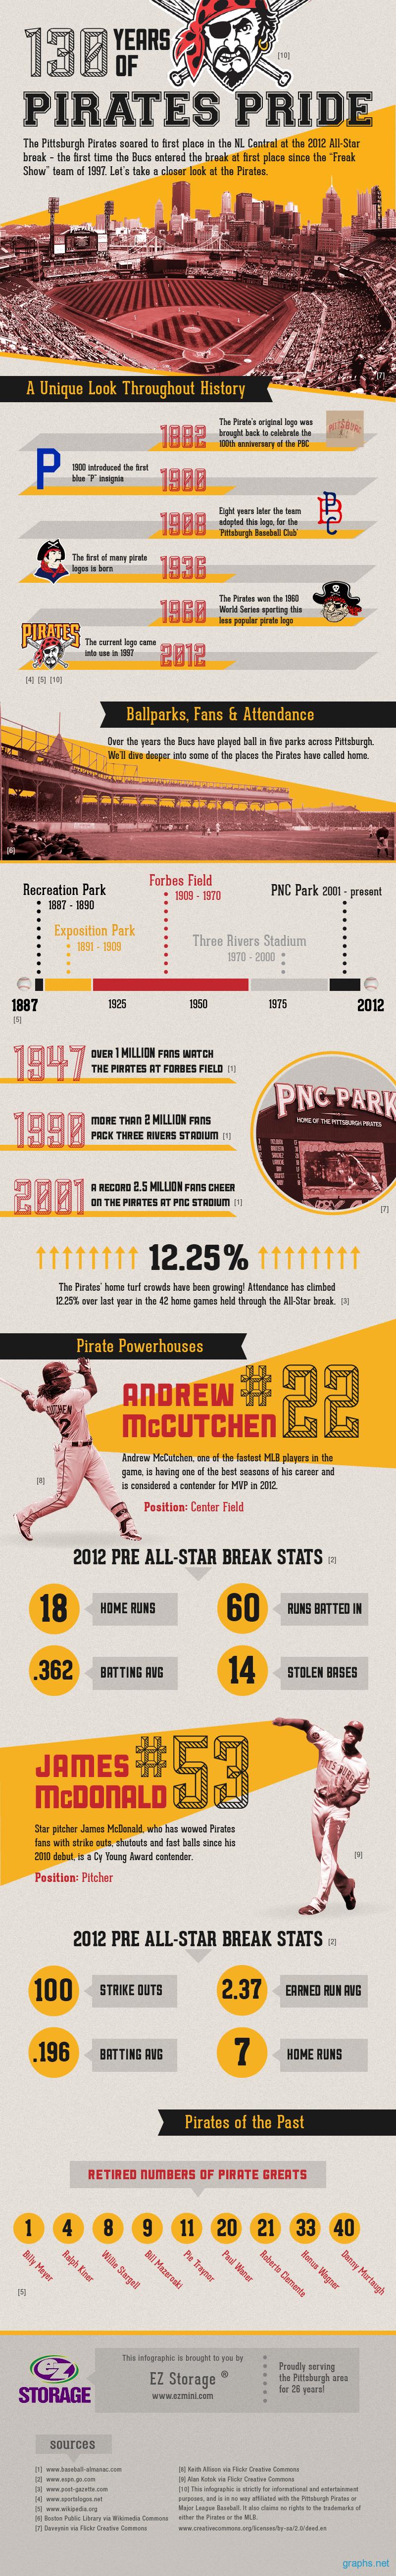 History of Pirates Pride